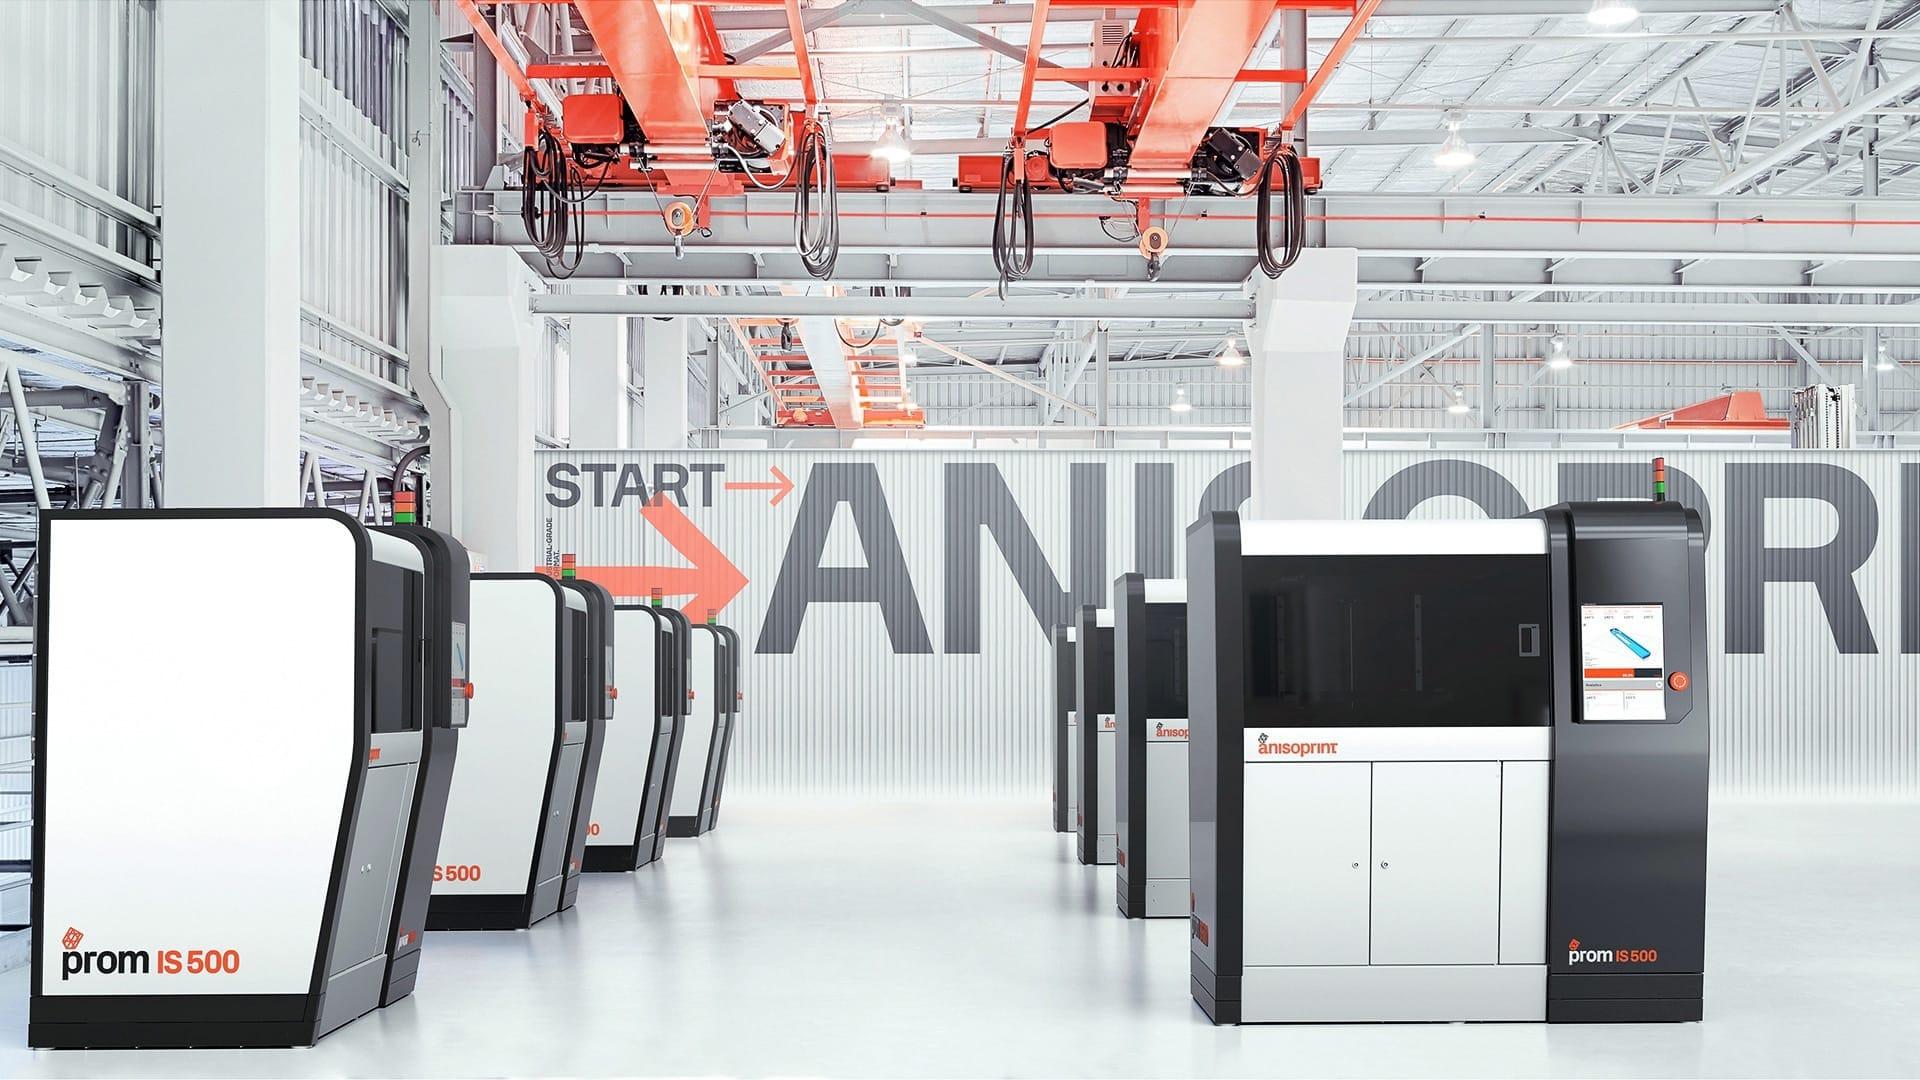 Industrial-anisoprinting_main_1920x1080